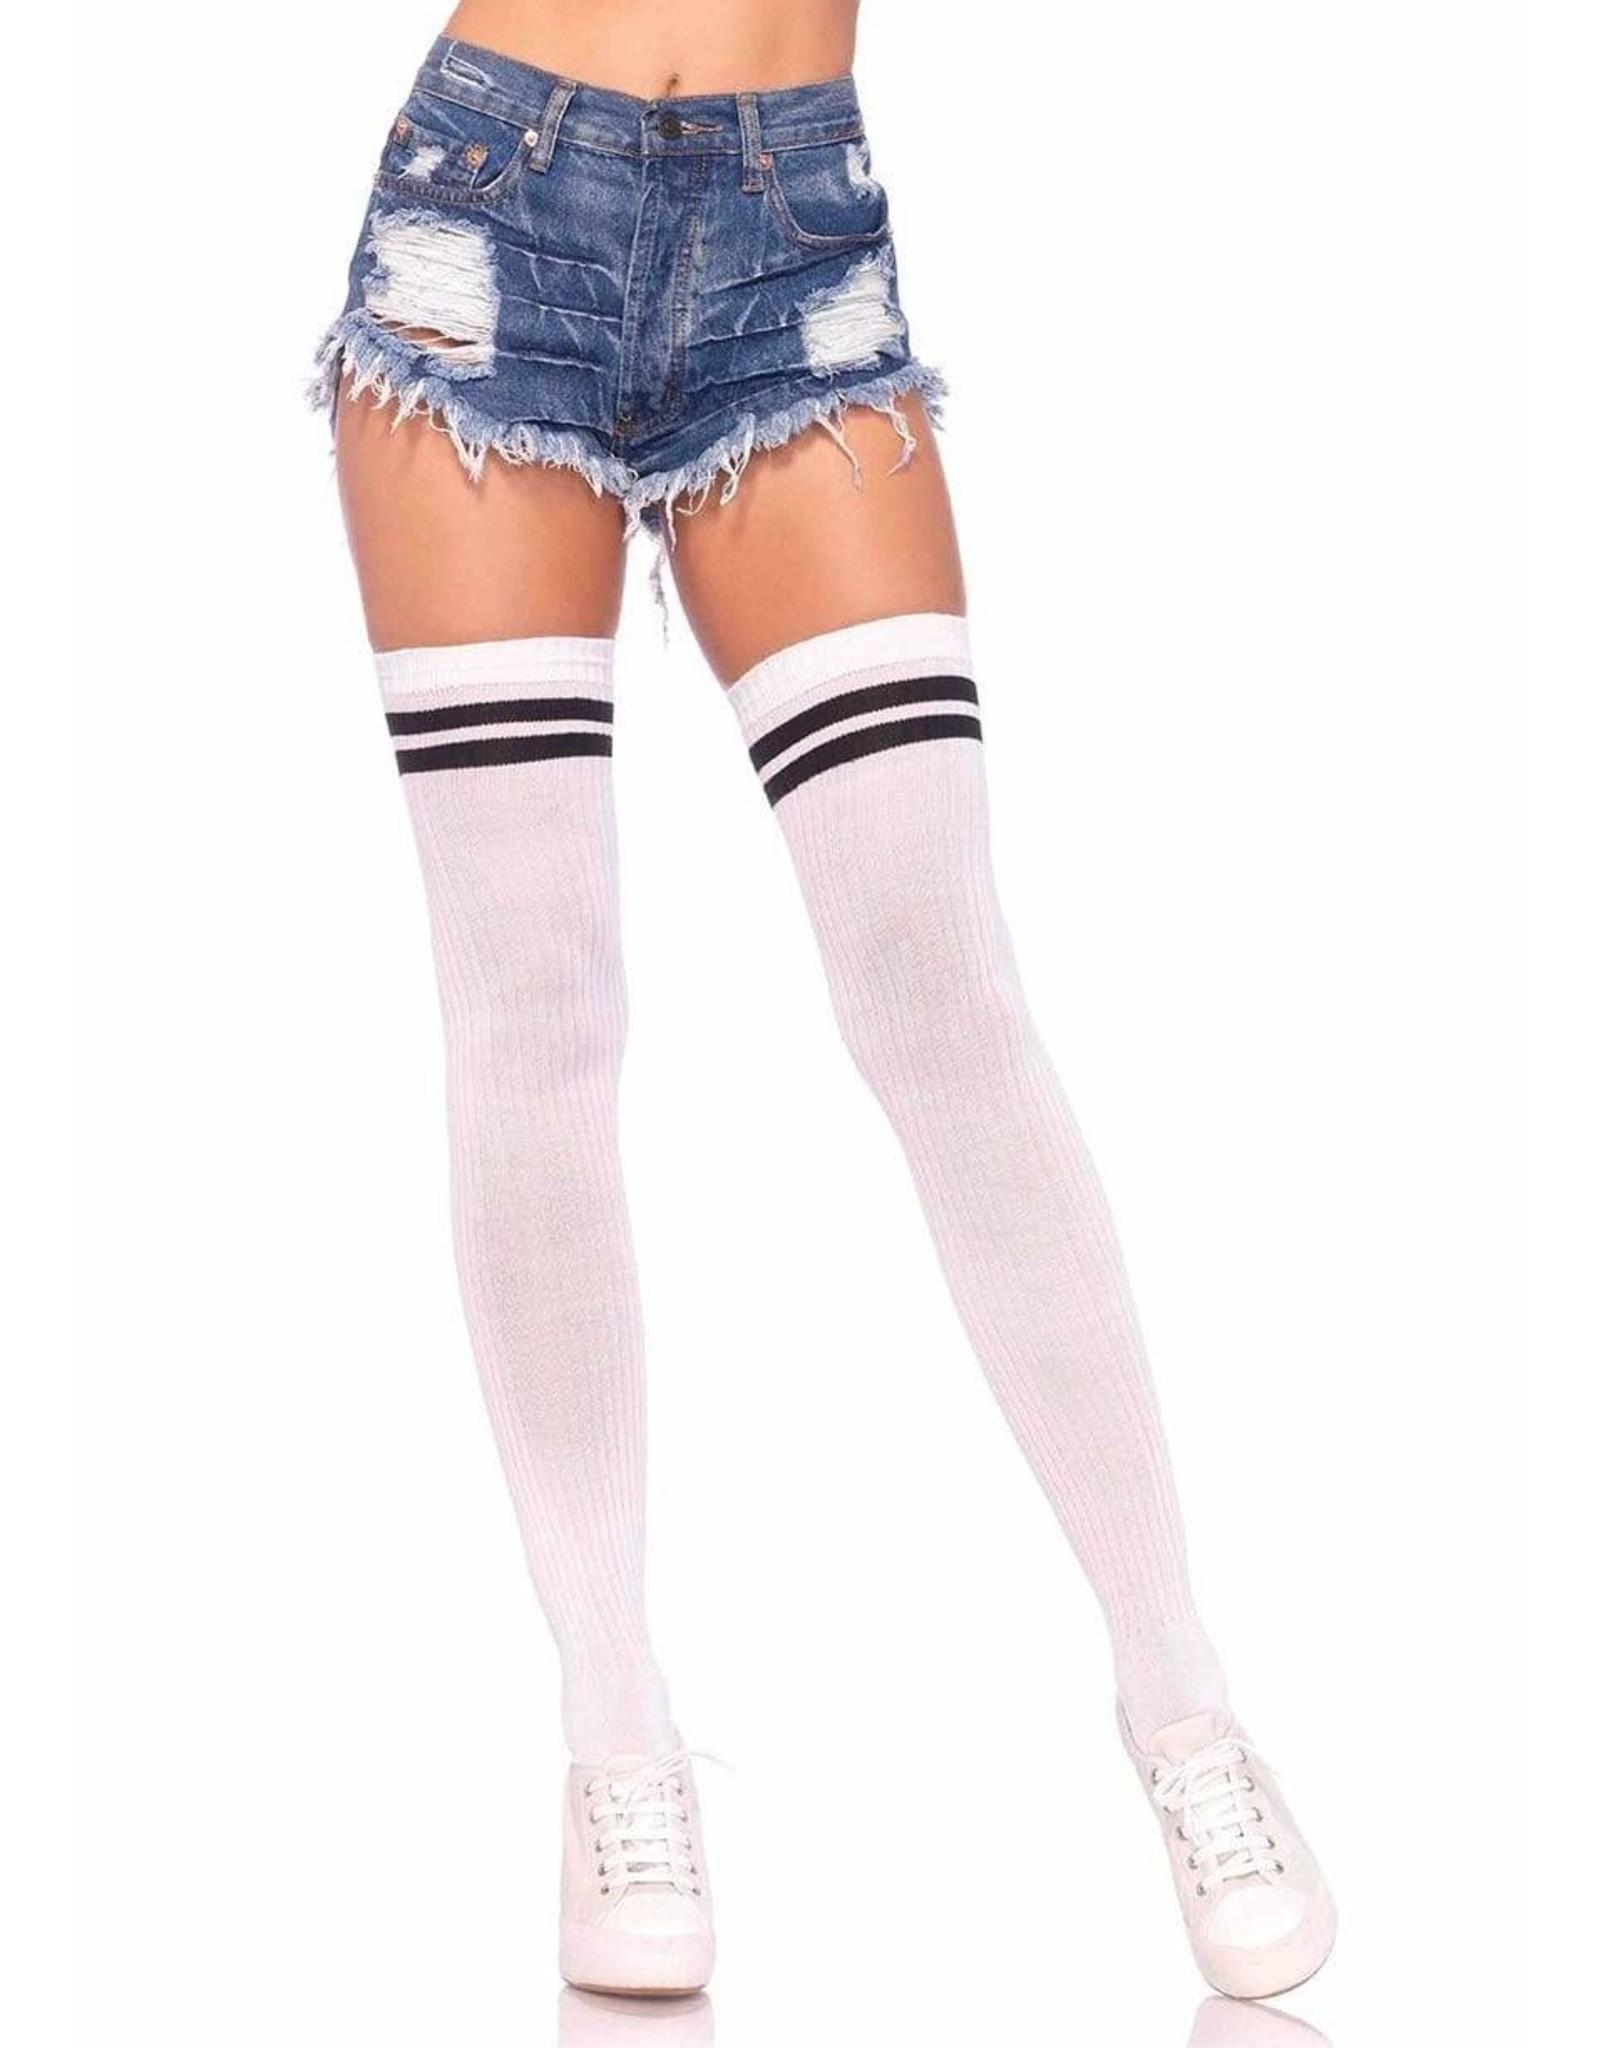 Leg Avenue Athletic Thigh Highs Wht/Blk